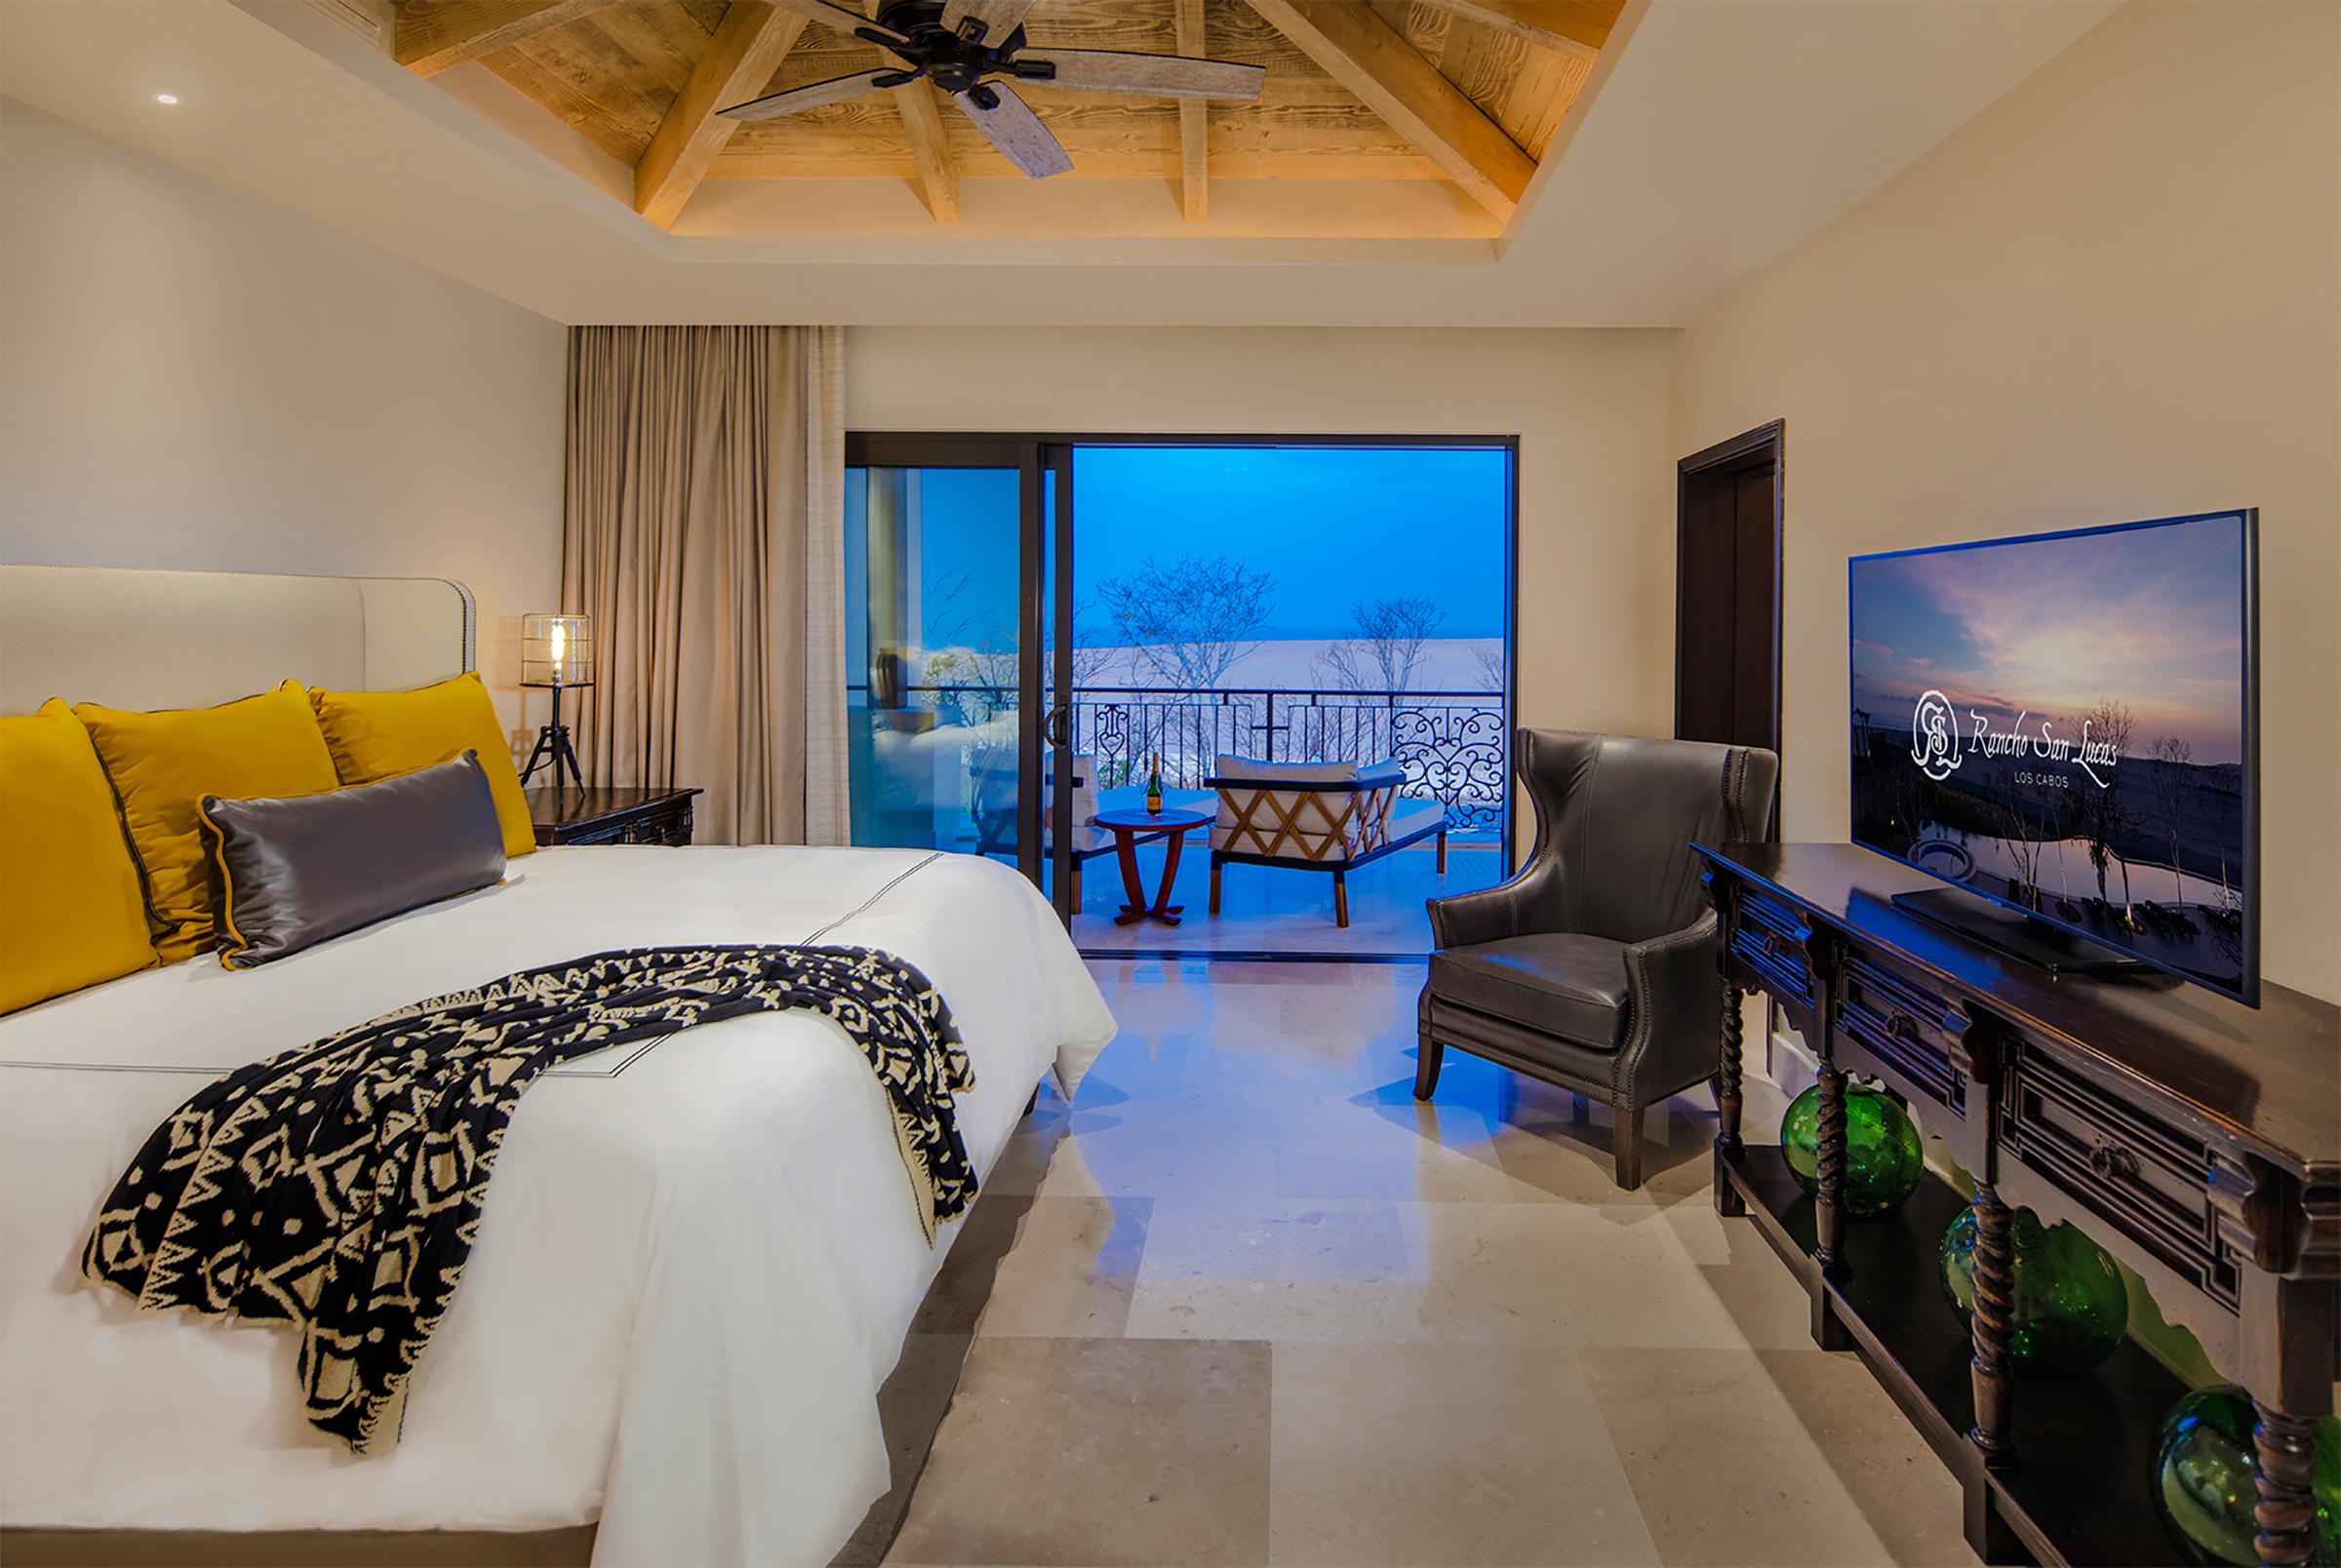 A room at the Rancho San Lucas hotel.